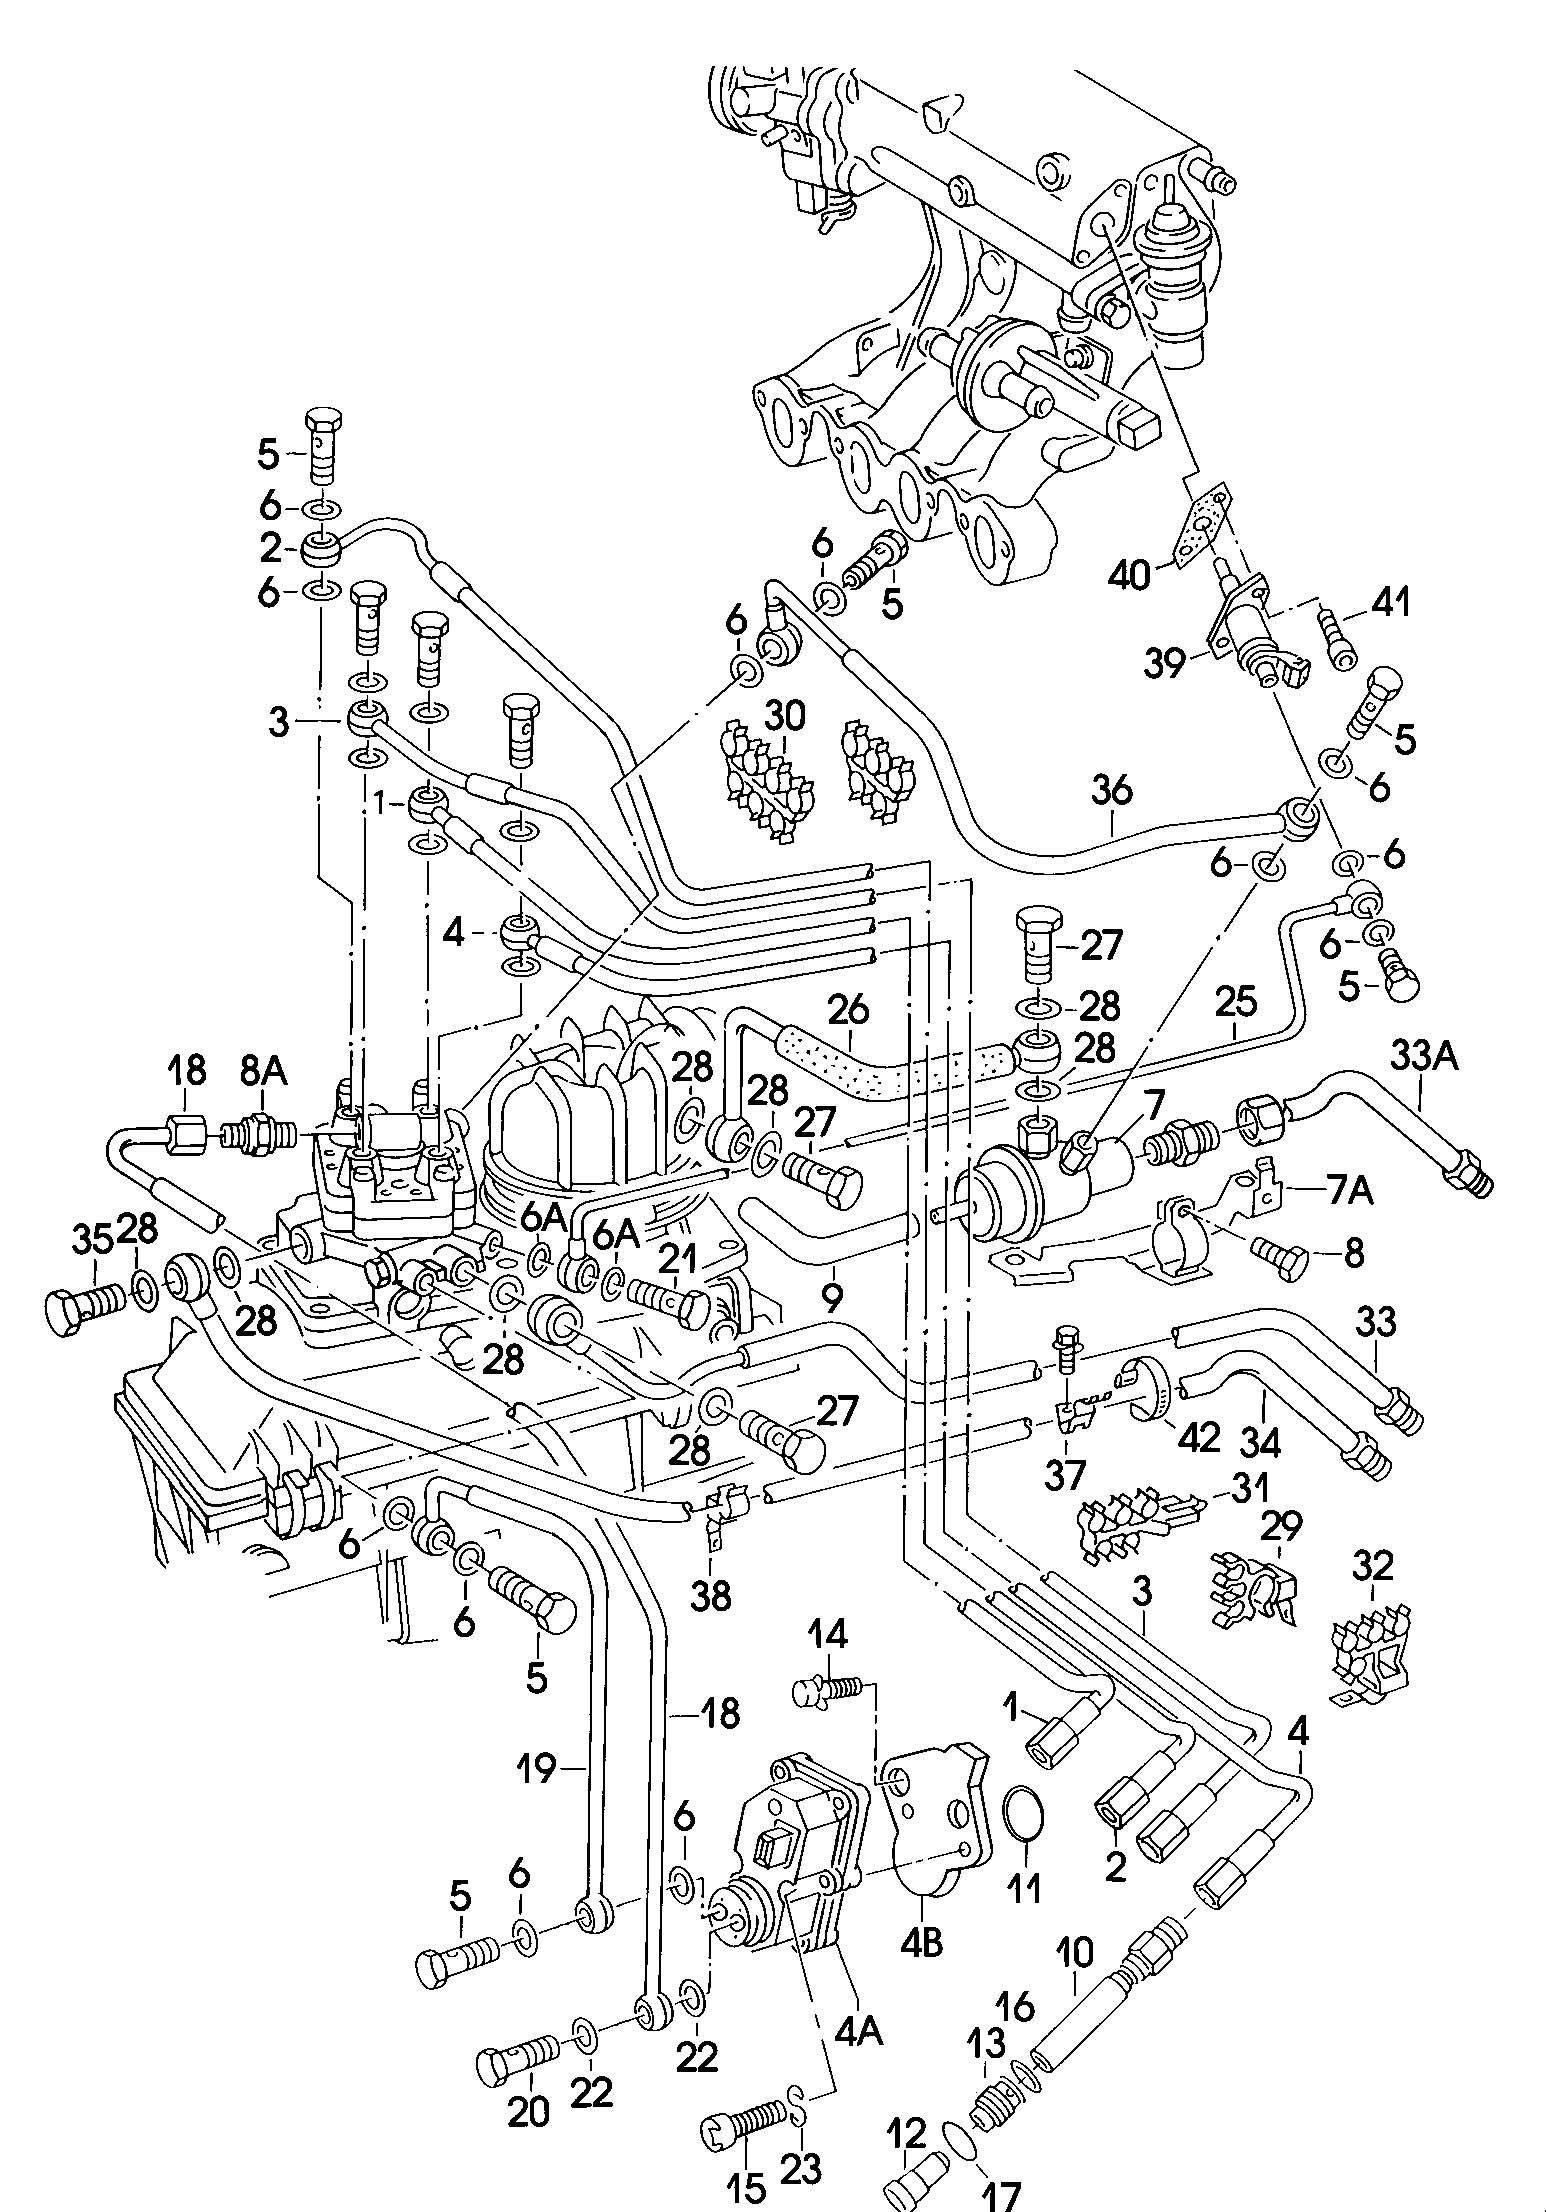 1987 Volkswagen Golf 1.8L KE-Jetronic Cold start valve